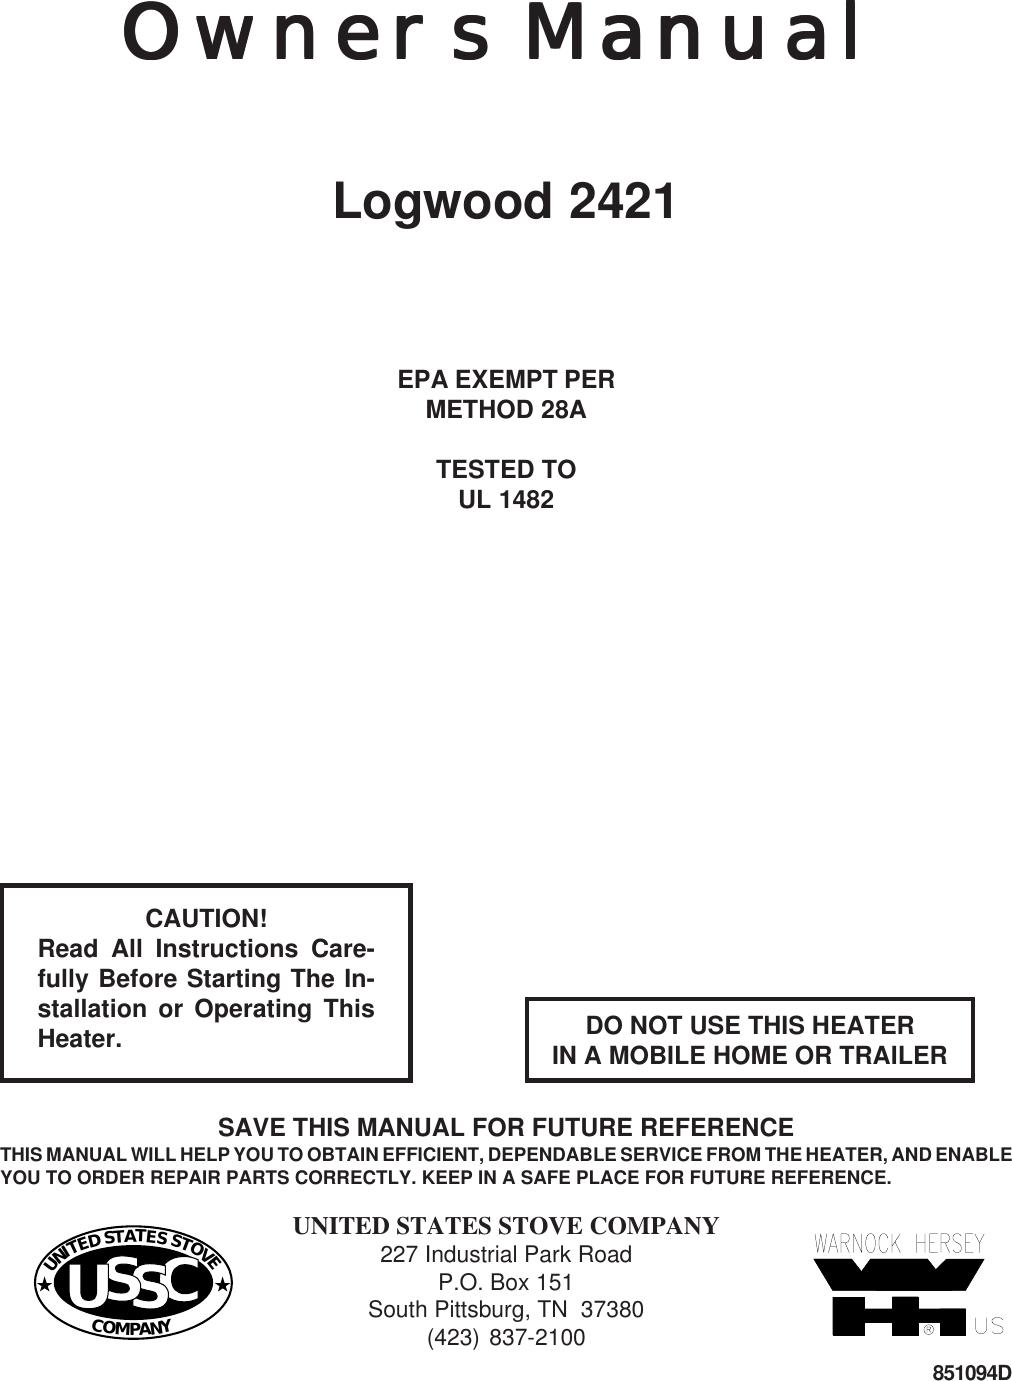 united states stove logwood 2421 users manual rh usermanual wiki Whirlpool Stove Manual Kenmore Stove Manual